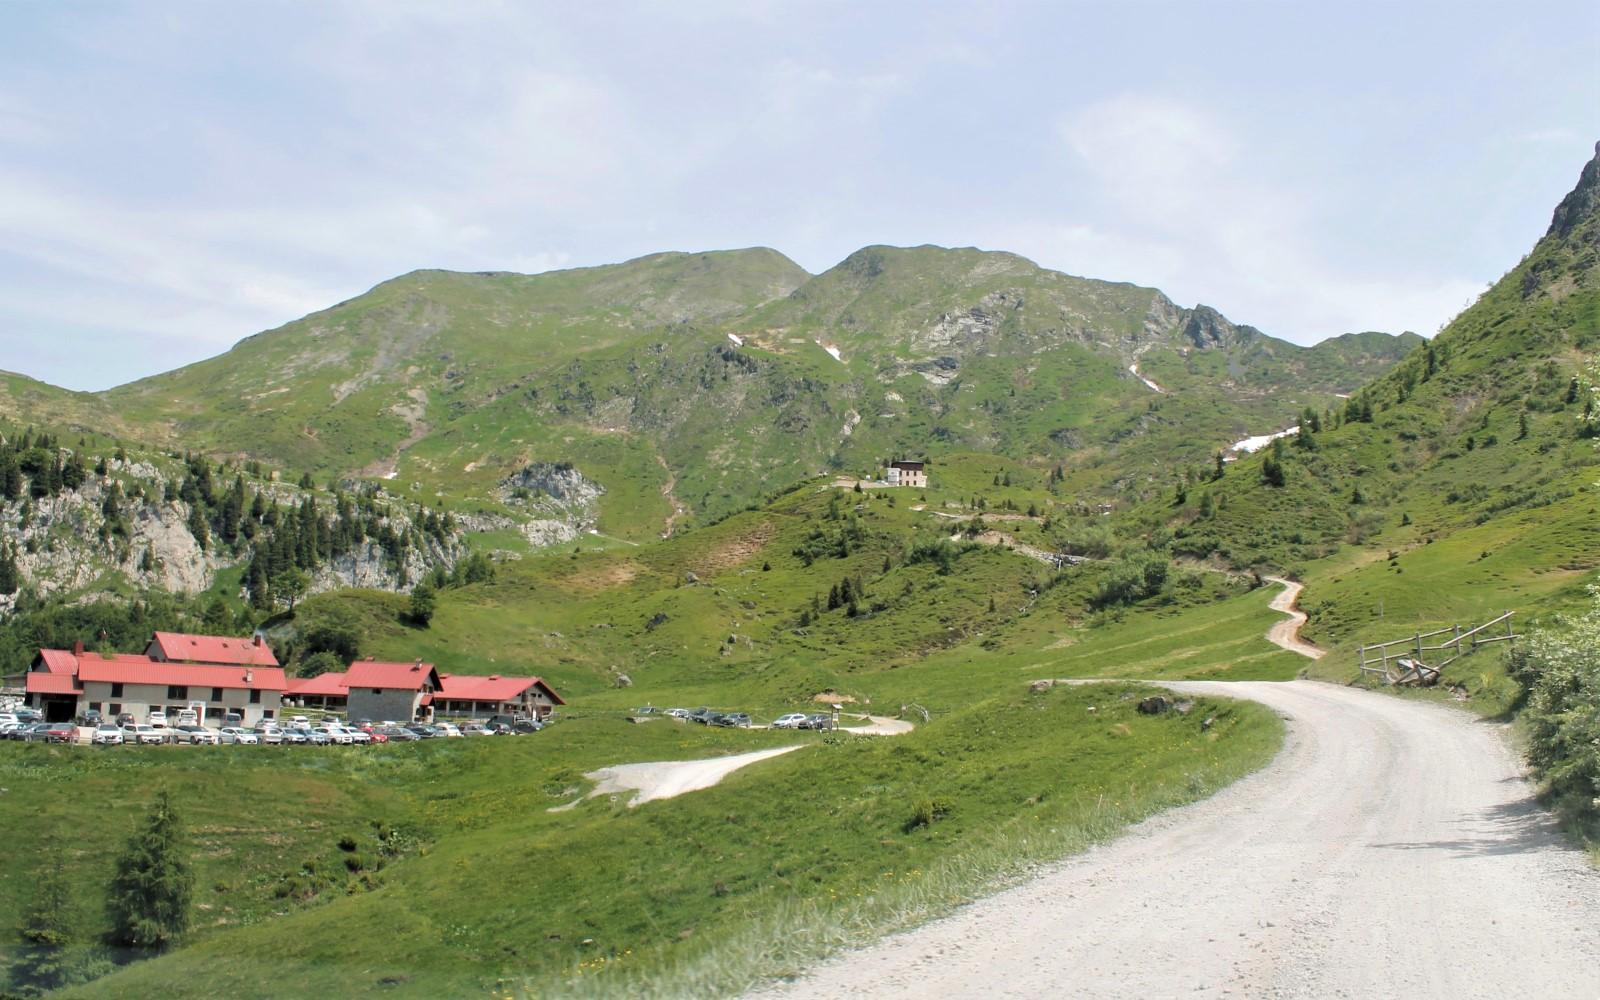 The road to Malga Pramosio